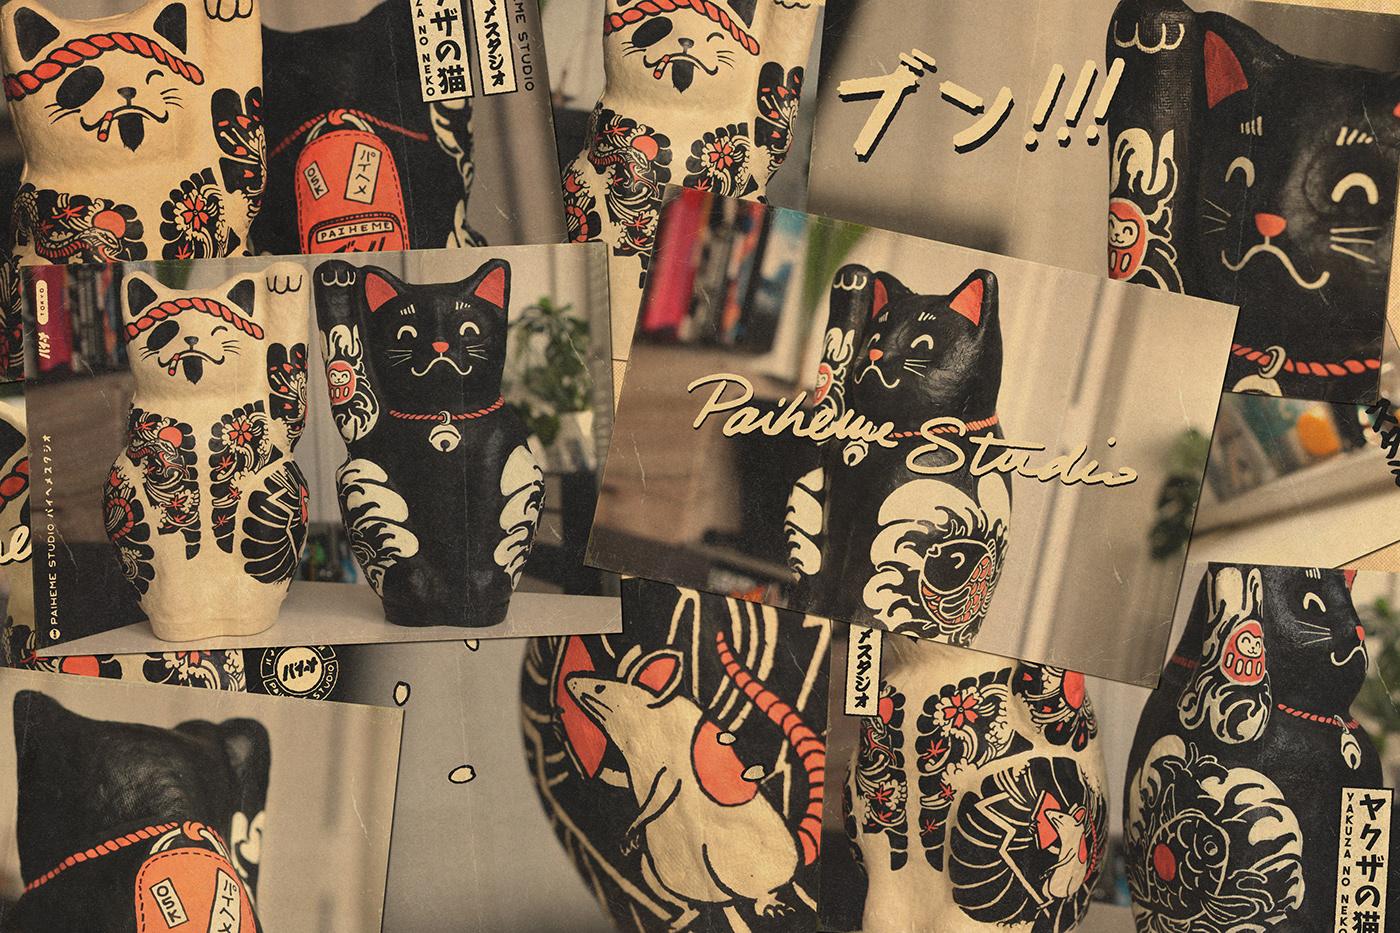 paiheme graphicdesign vintage Retro paihemestudio typography   JapaneseDesign Exhibition  tattoo japan